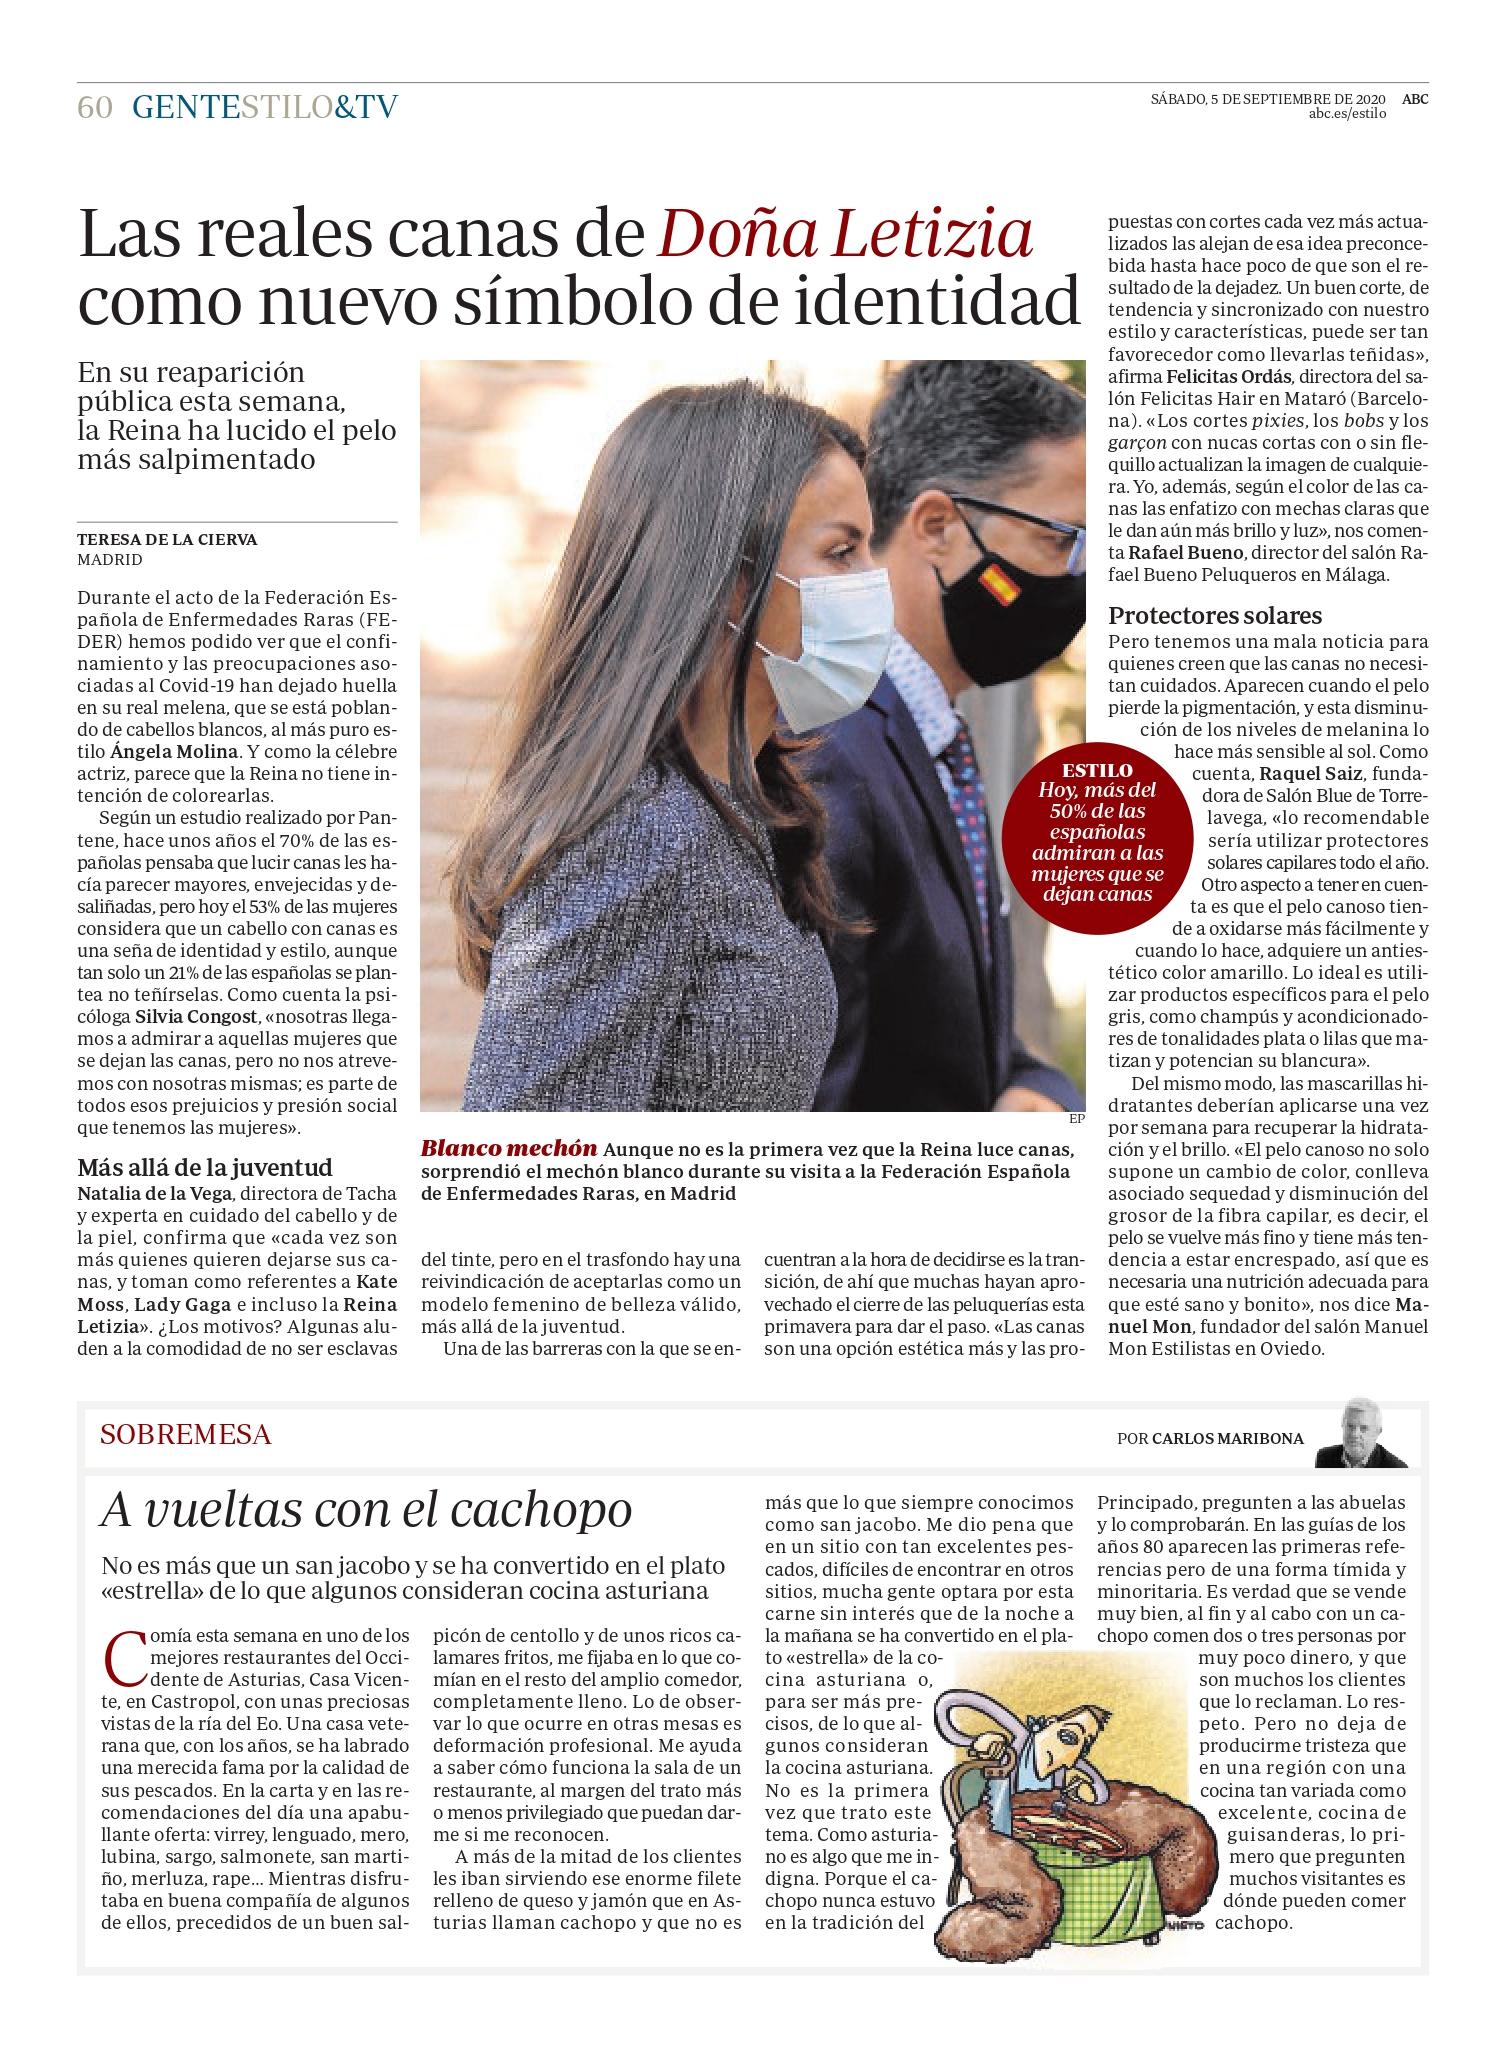 https://www.salonbluebyraquelsaiz.es/wp-content/uploads/2020/12/ABS-Raquel-Saiz.jpg